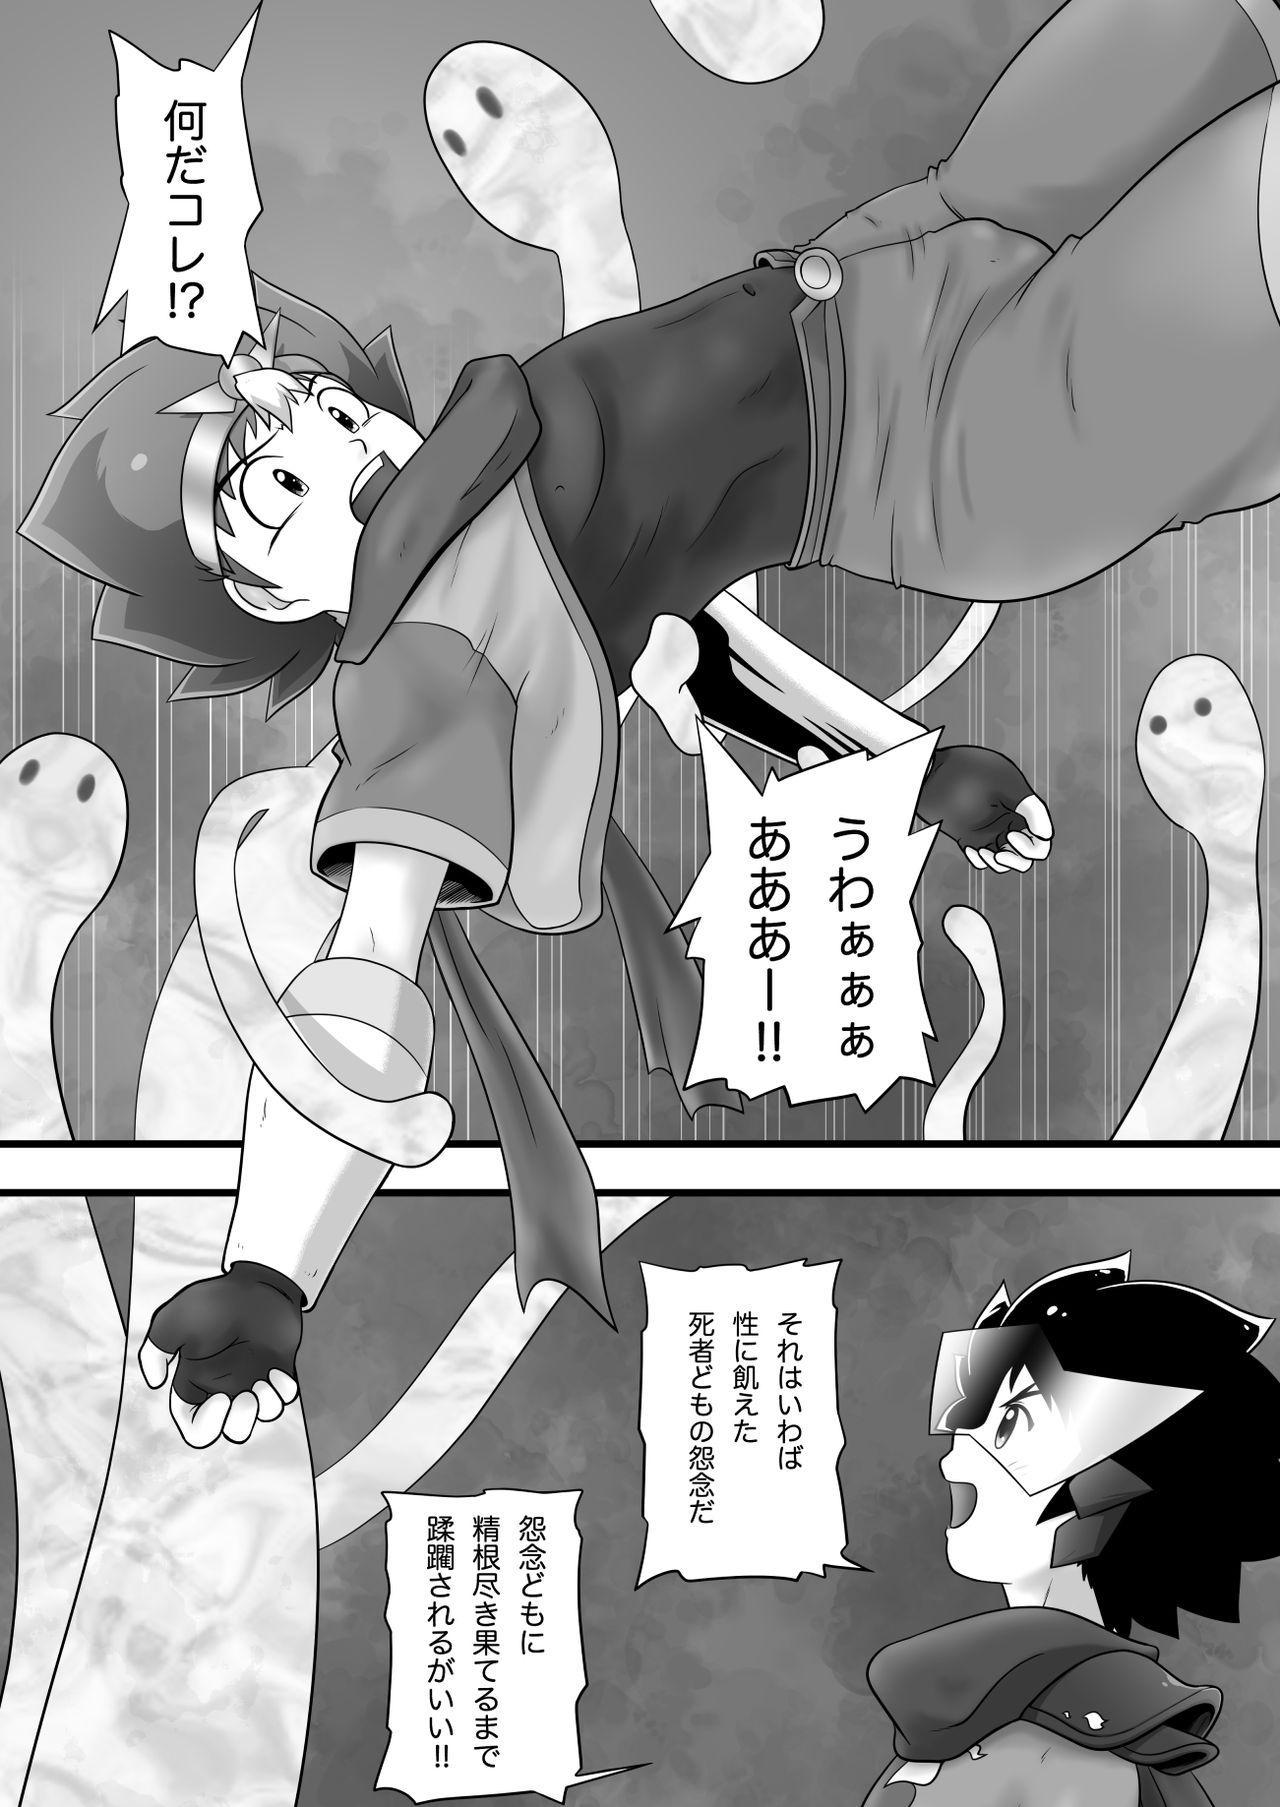 Chrono Kid TSURUGI VS Enboy 16